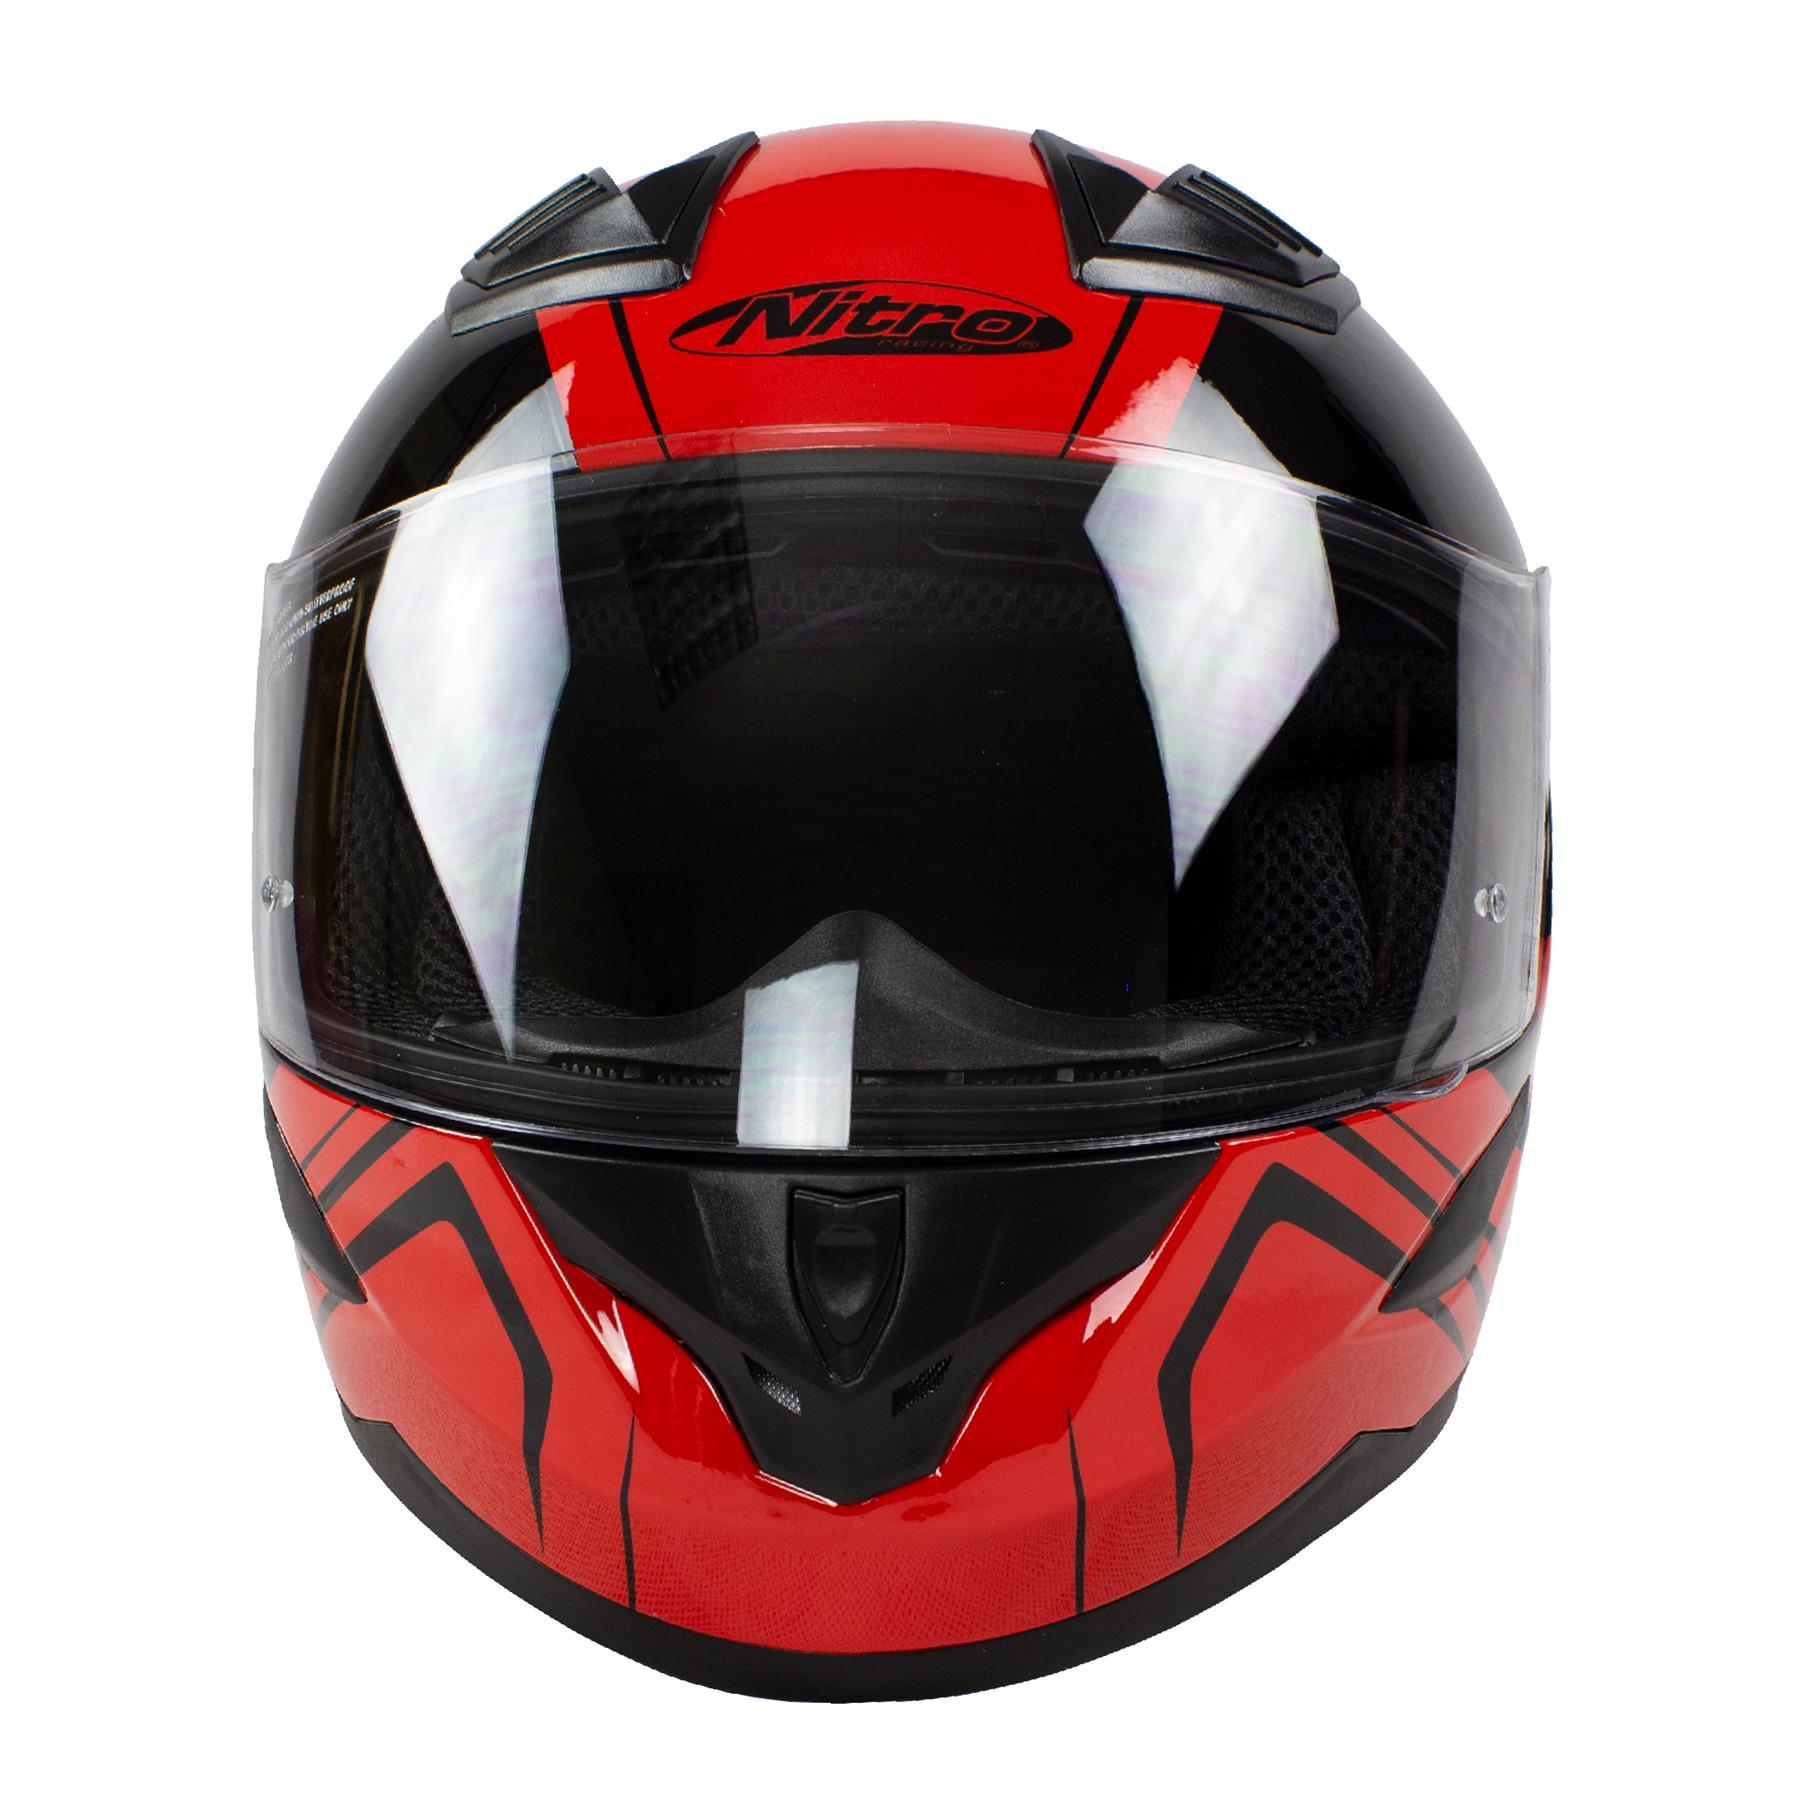 Nitro-N2400-Rogue-Full-Face-Motorcycle-Motorbike-Crash-Helmet-Black-Blue-Red thumbnail 23